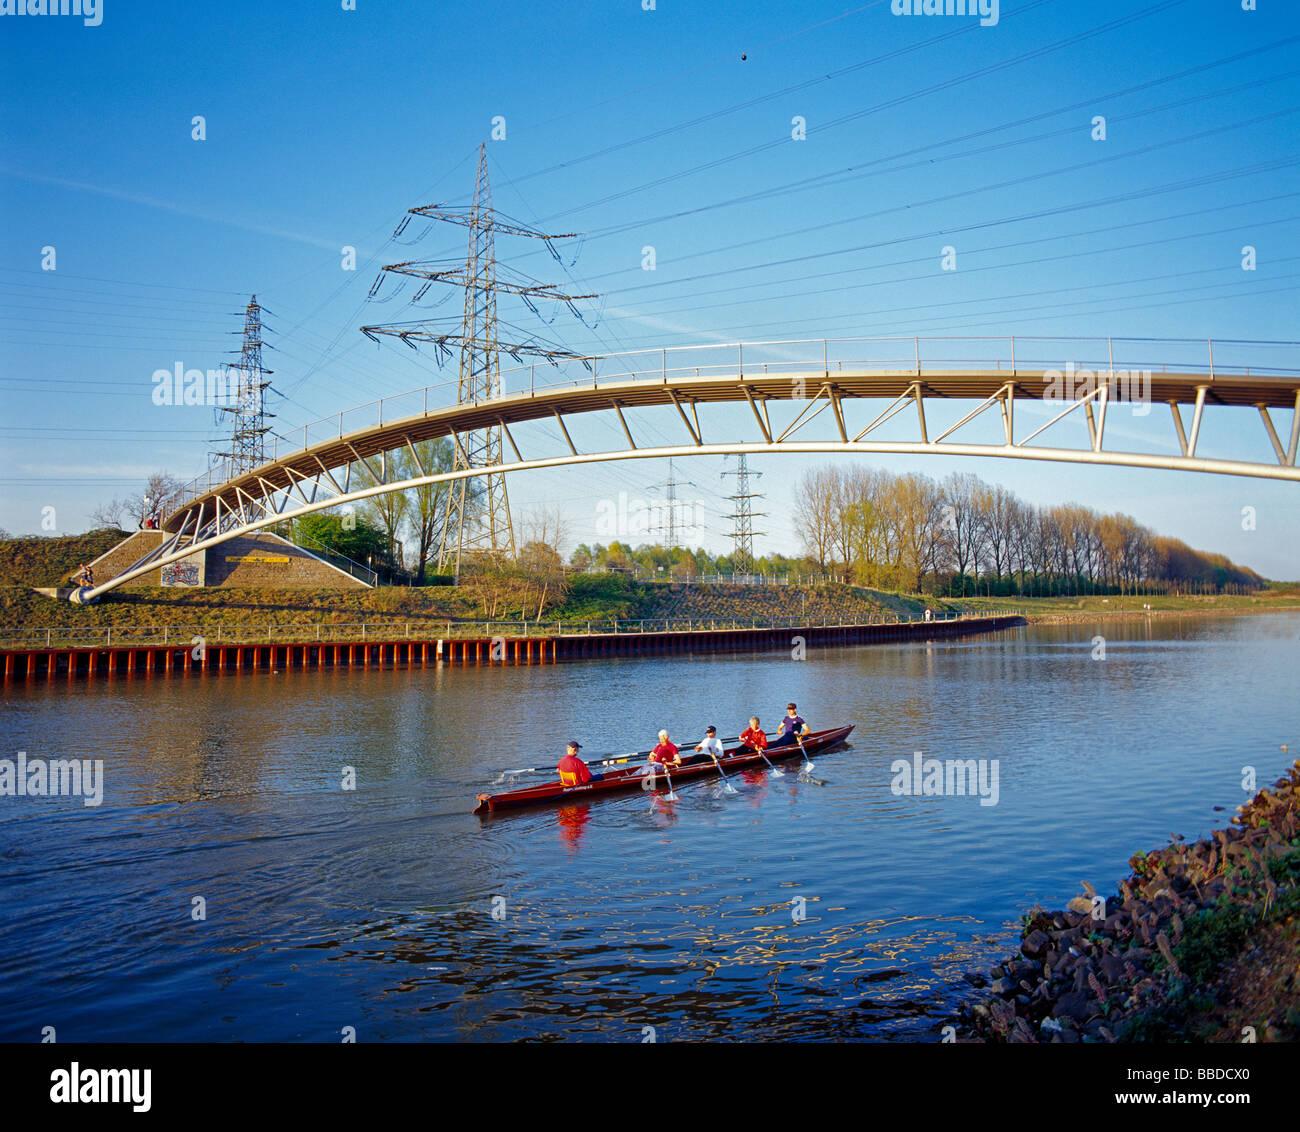 oarsmen in a foursome are rowing under a pedestrian bridge over the Rhein Herne Canal Kulturhauptstadt Europa 2010 Stock Photo